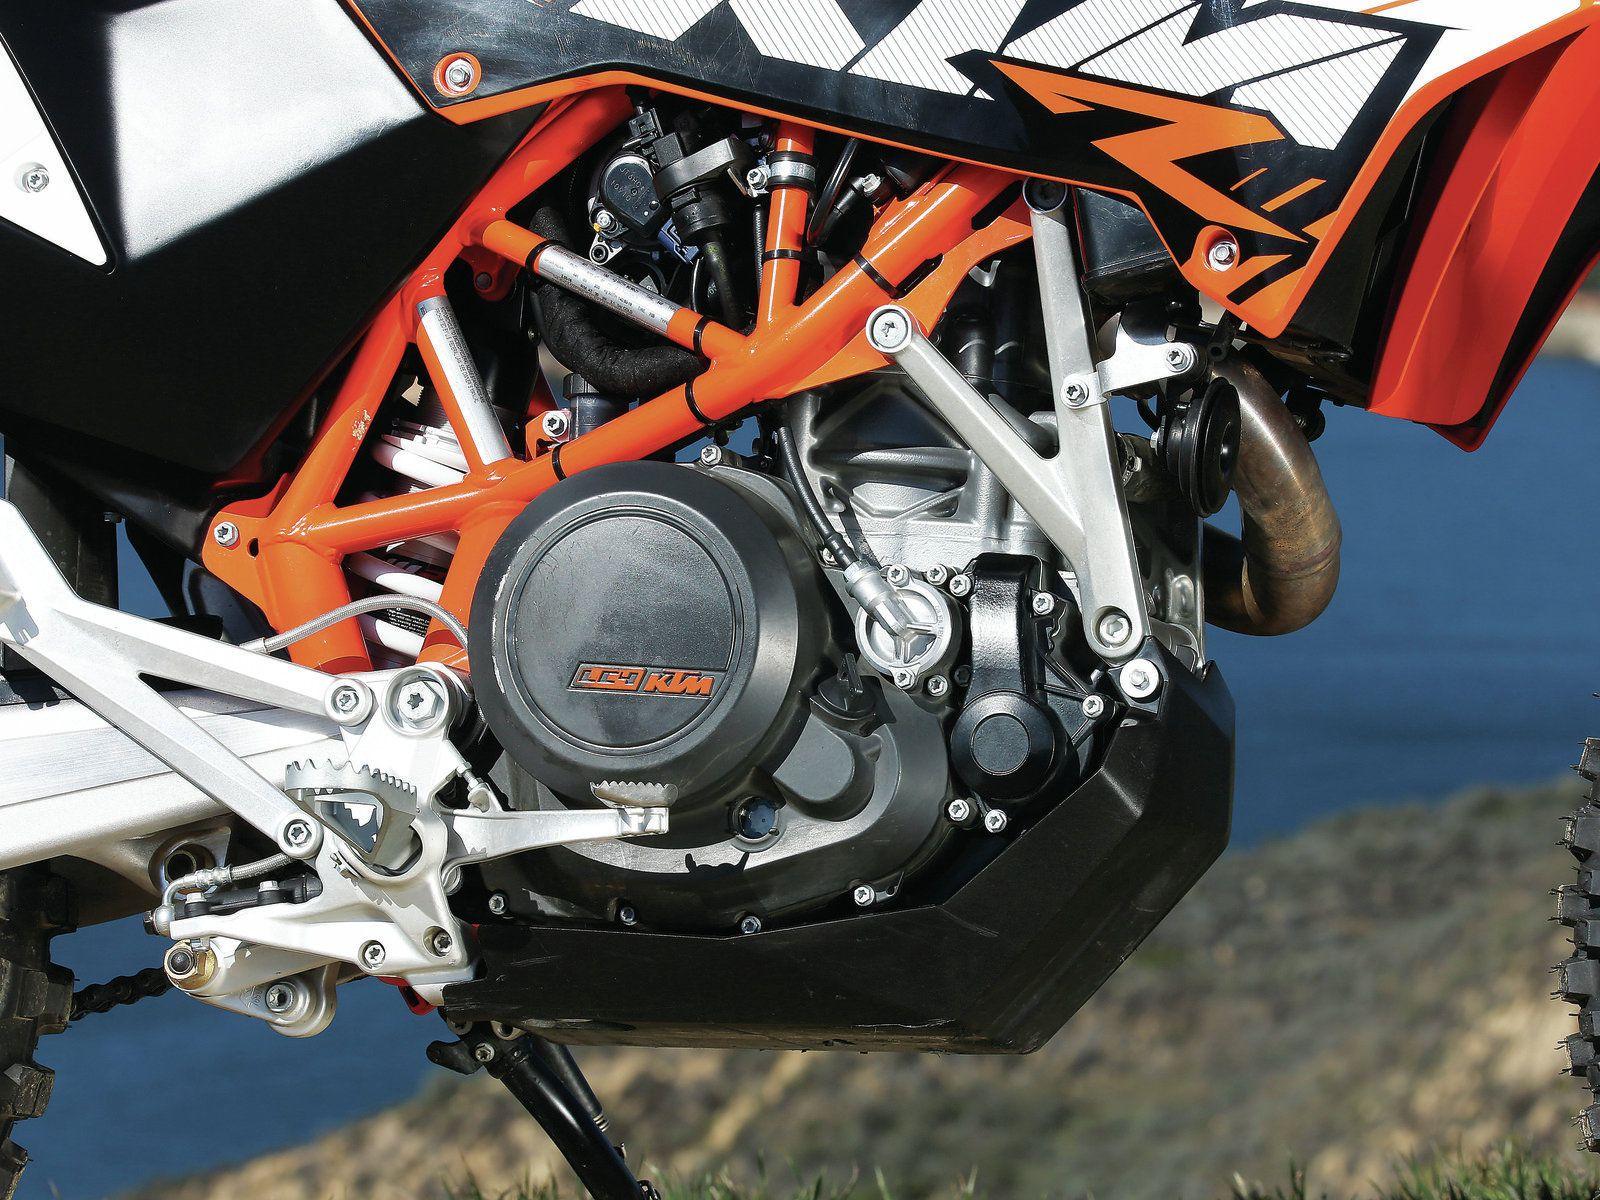 Husqvarna TR650 Terra vs  Kawasaki KLR650 vs  KTM 690 Enduro